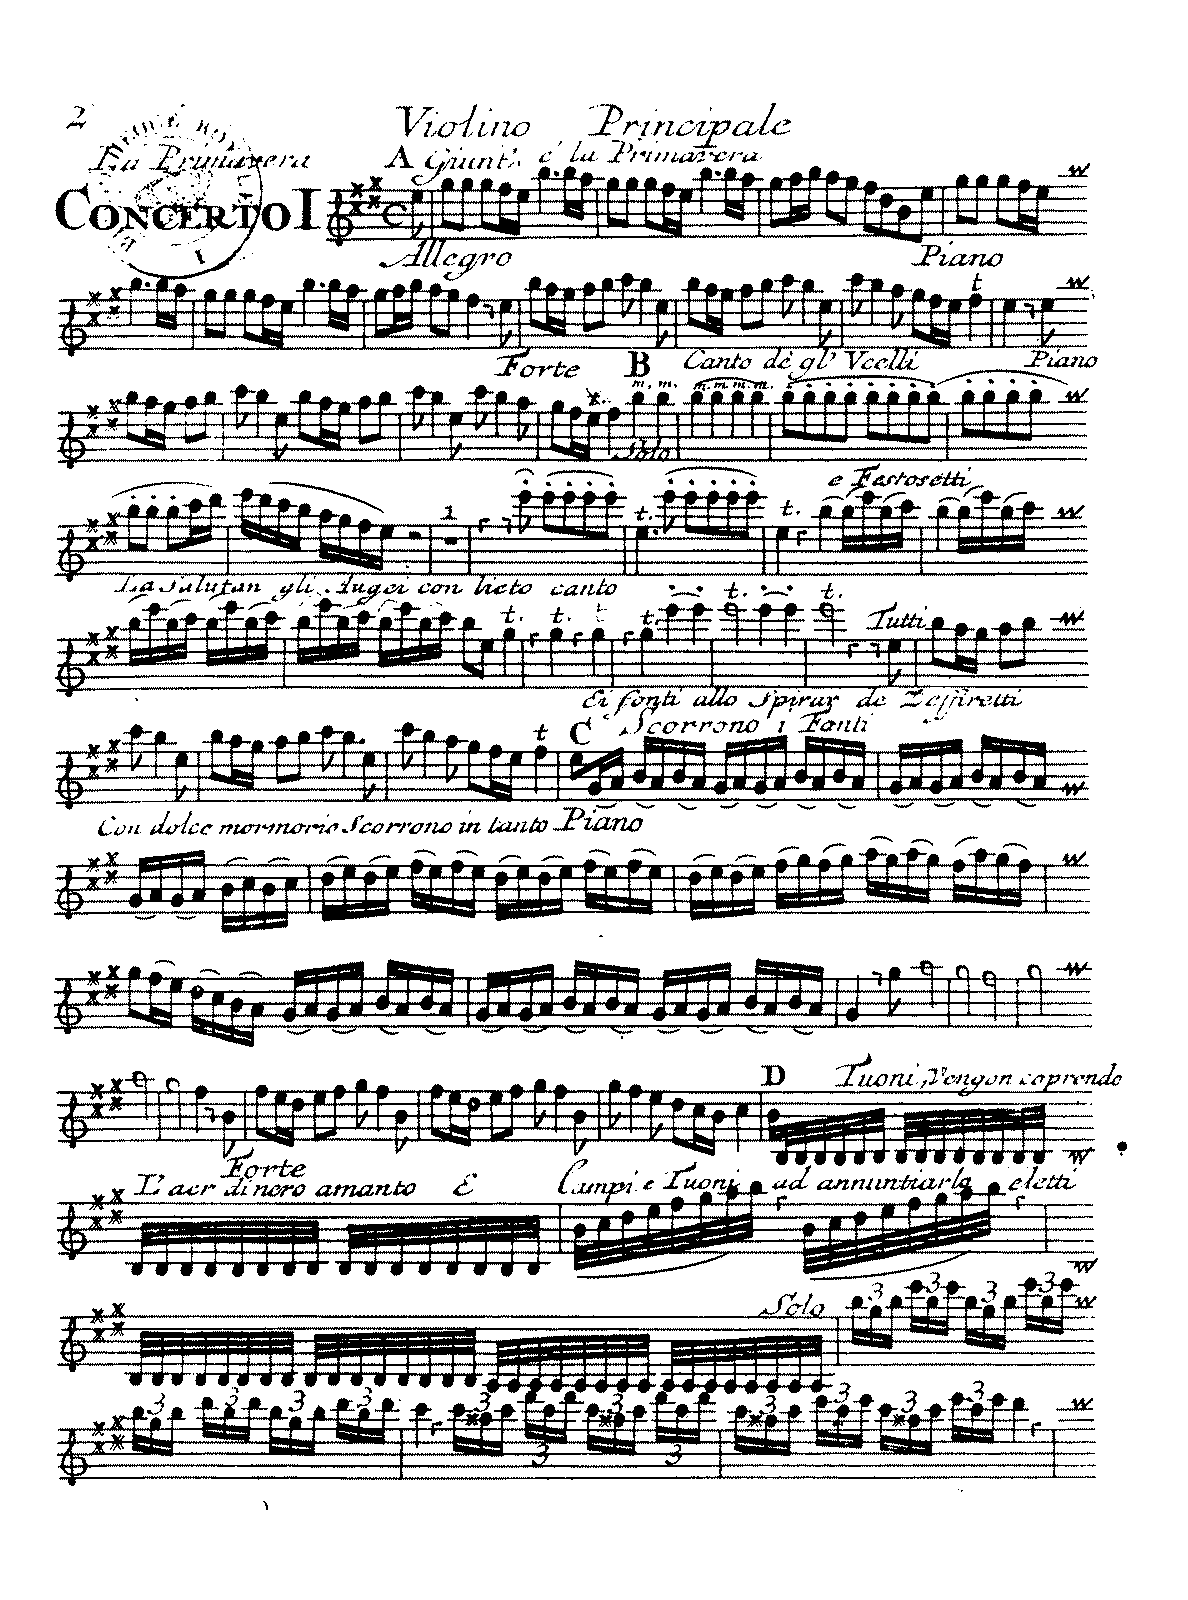 analysis of vivaldi violin concerto in Antonio vivaldi's concerto for violin and orchestra in a minor, op3, no6: musical analysis we will write a custom essay sample on antonio vivaldi's concerto for violin and orchestra in a minor, op3, no6.